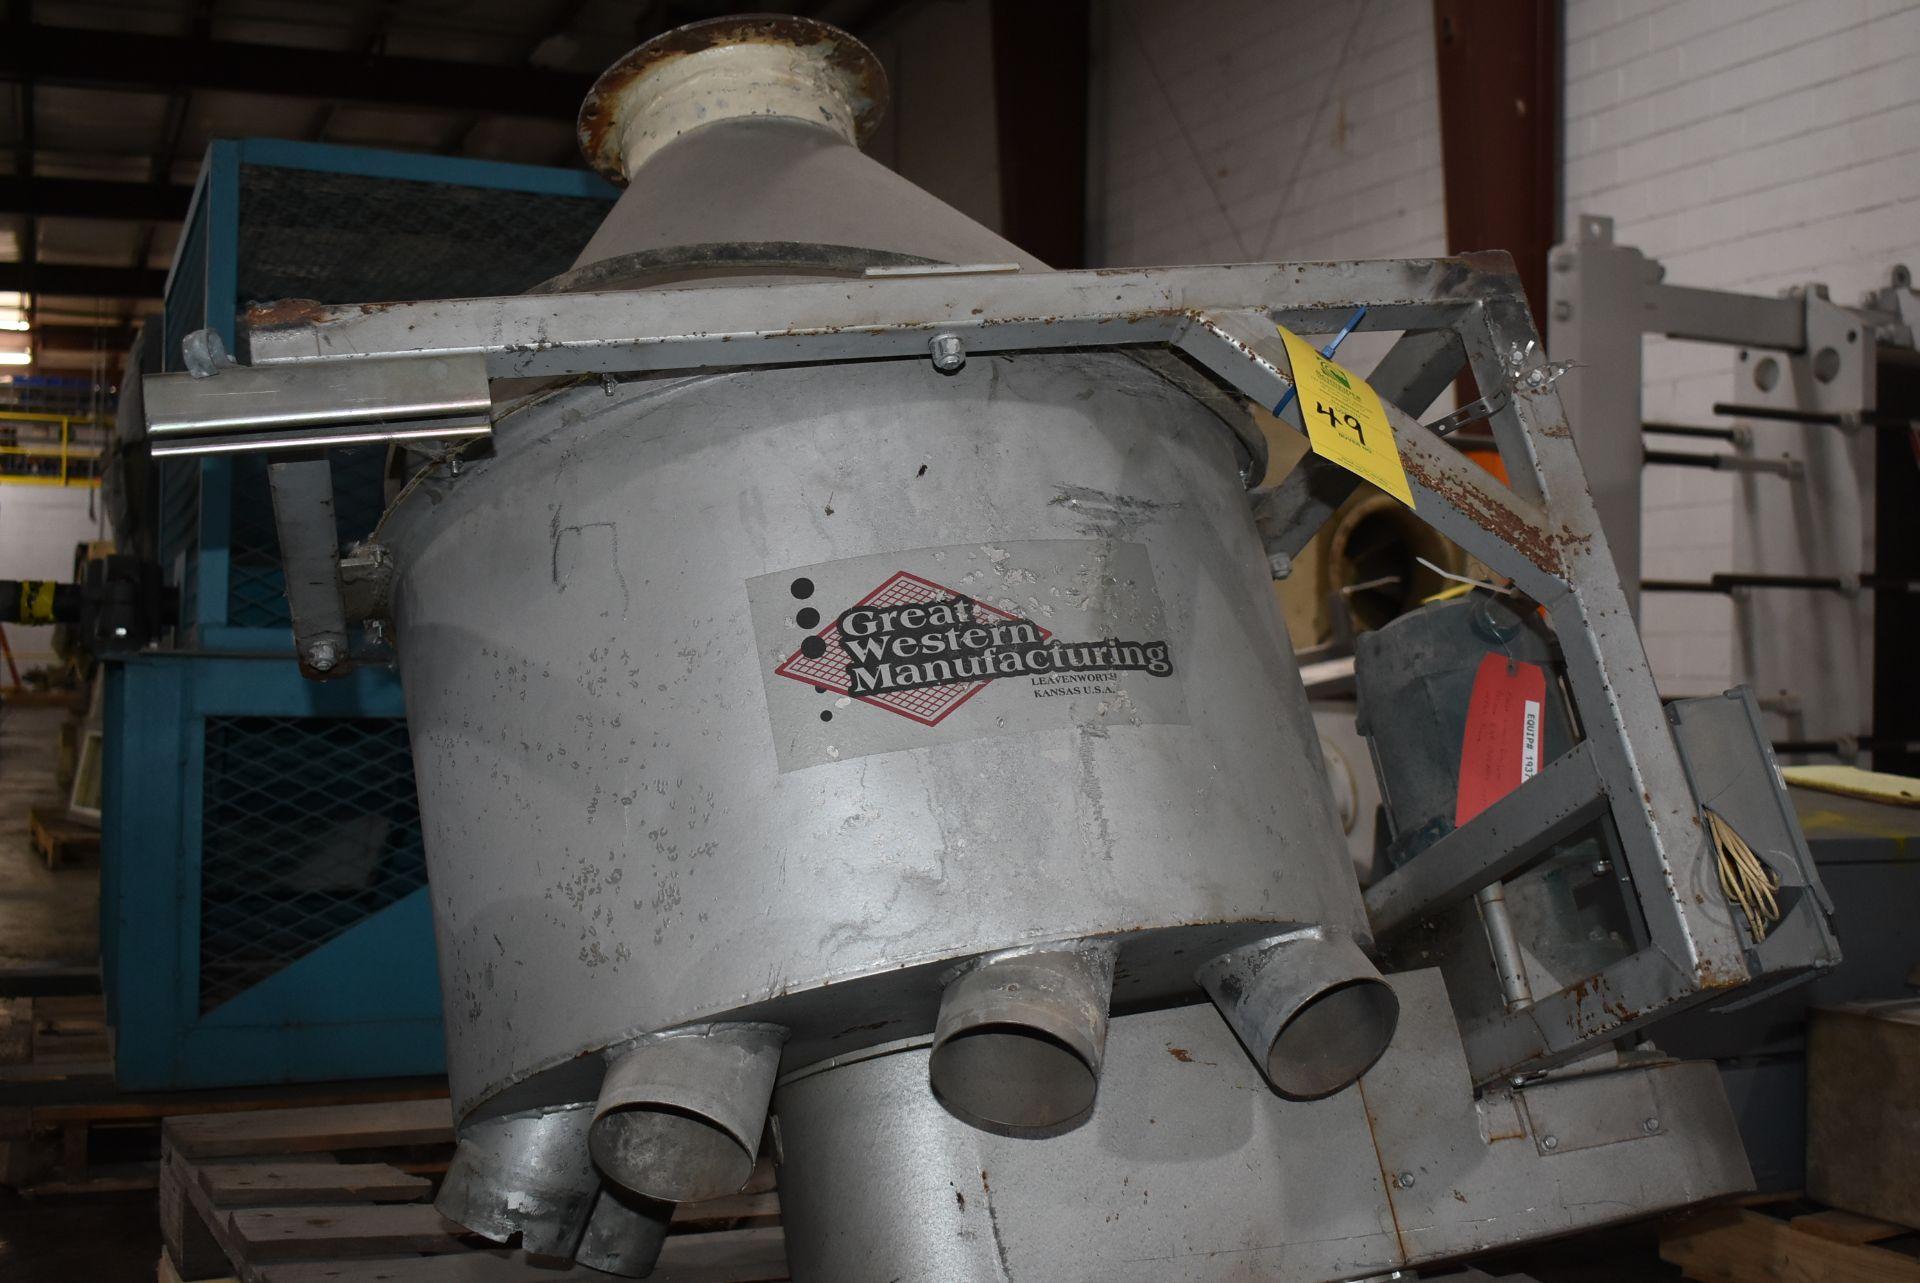 Great Western Hopper Distribution System, Stainless Steel Hopper w/Motor - Image 3 of 3